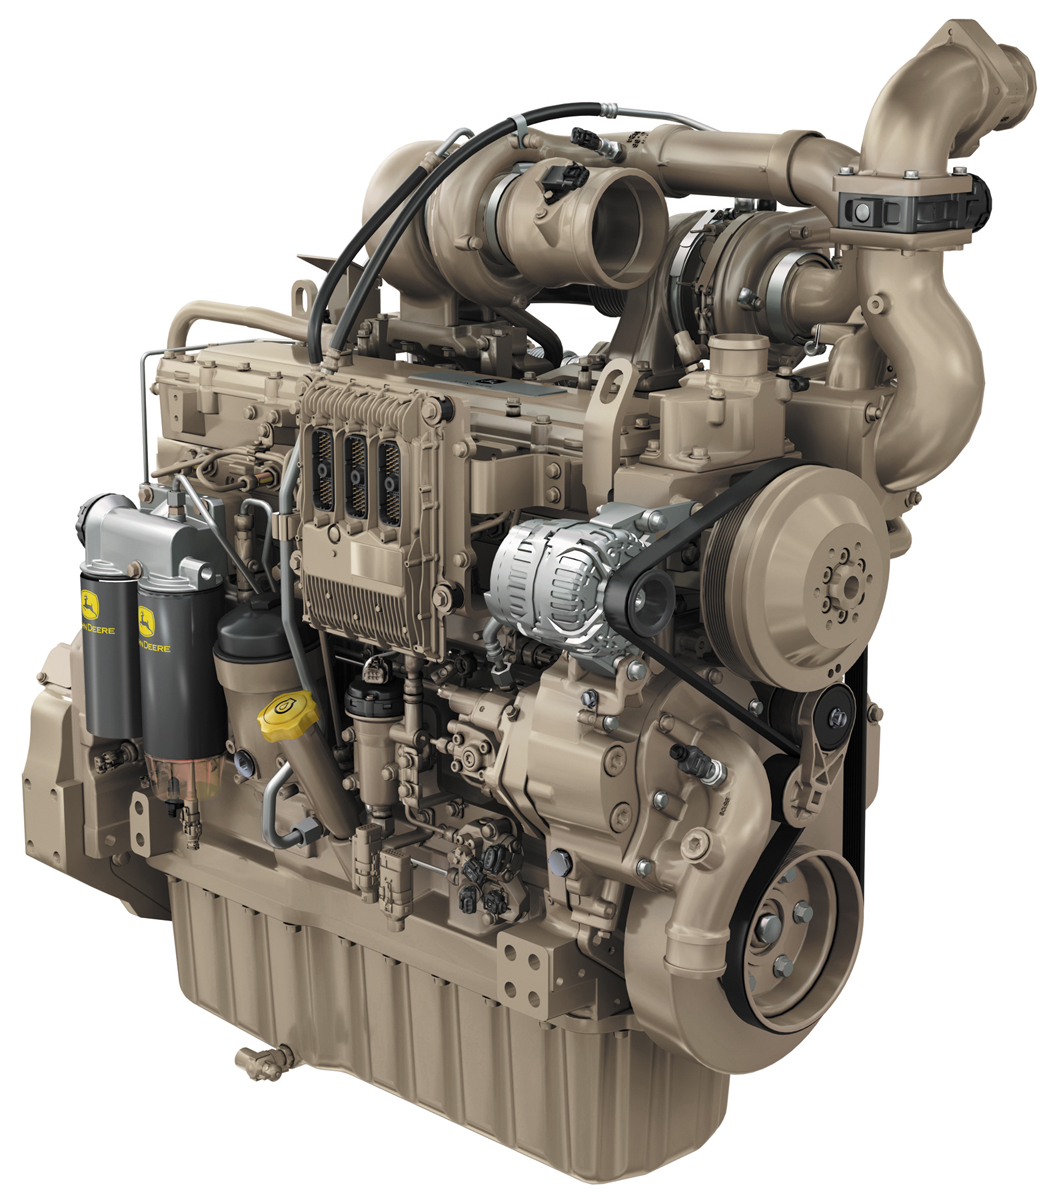 John Deere Industrial Engines Parts Service   Melton Industries